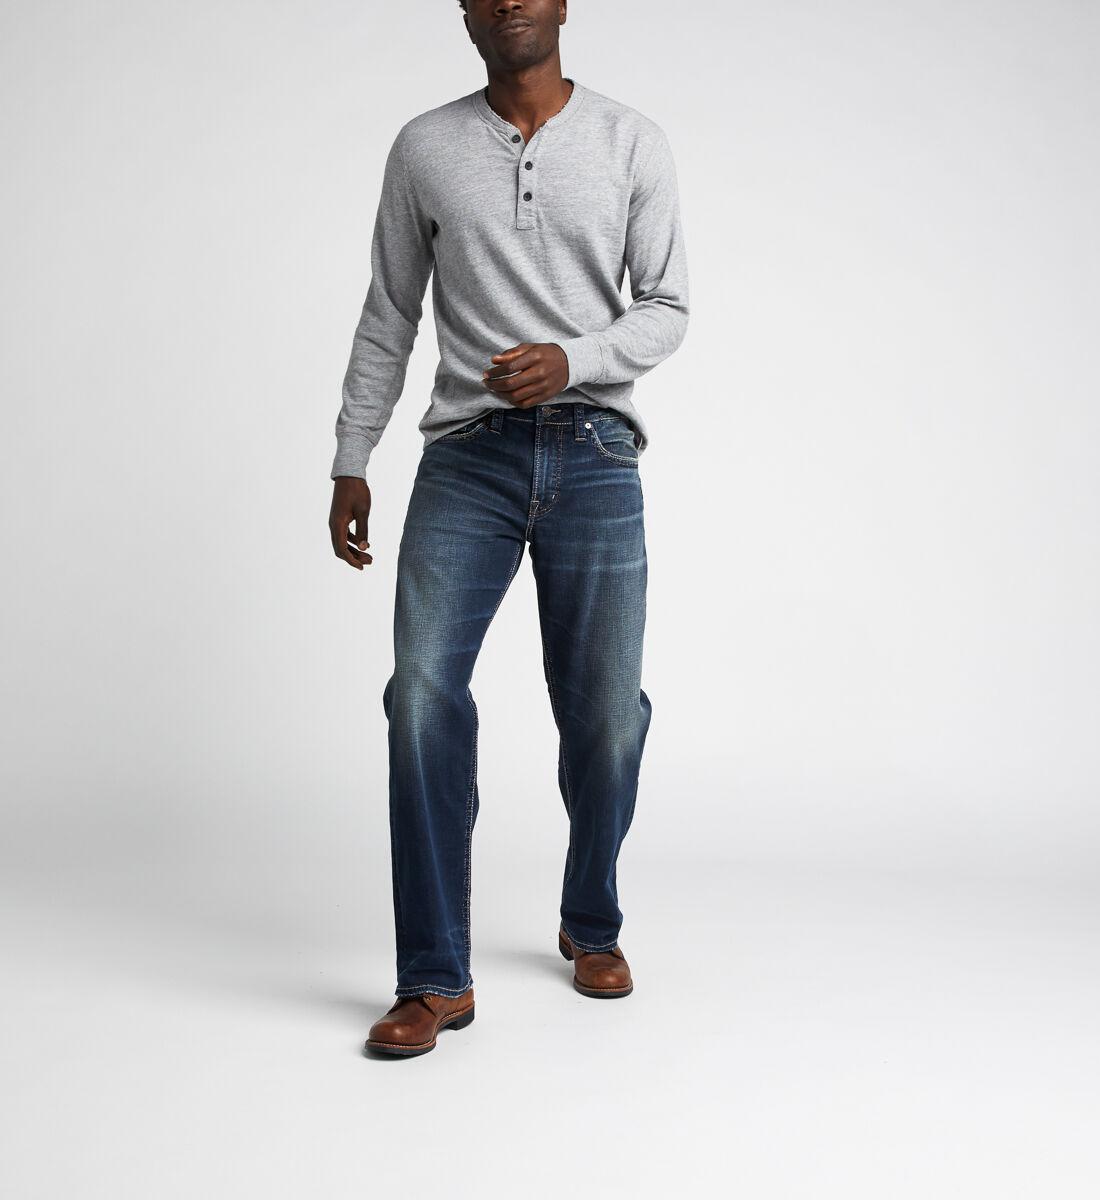 Gordie Loose Fit Straight Jeans,Indigo Alt Image 1